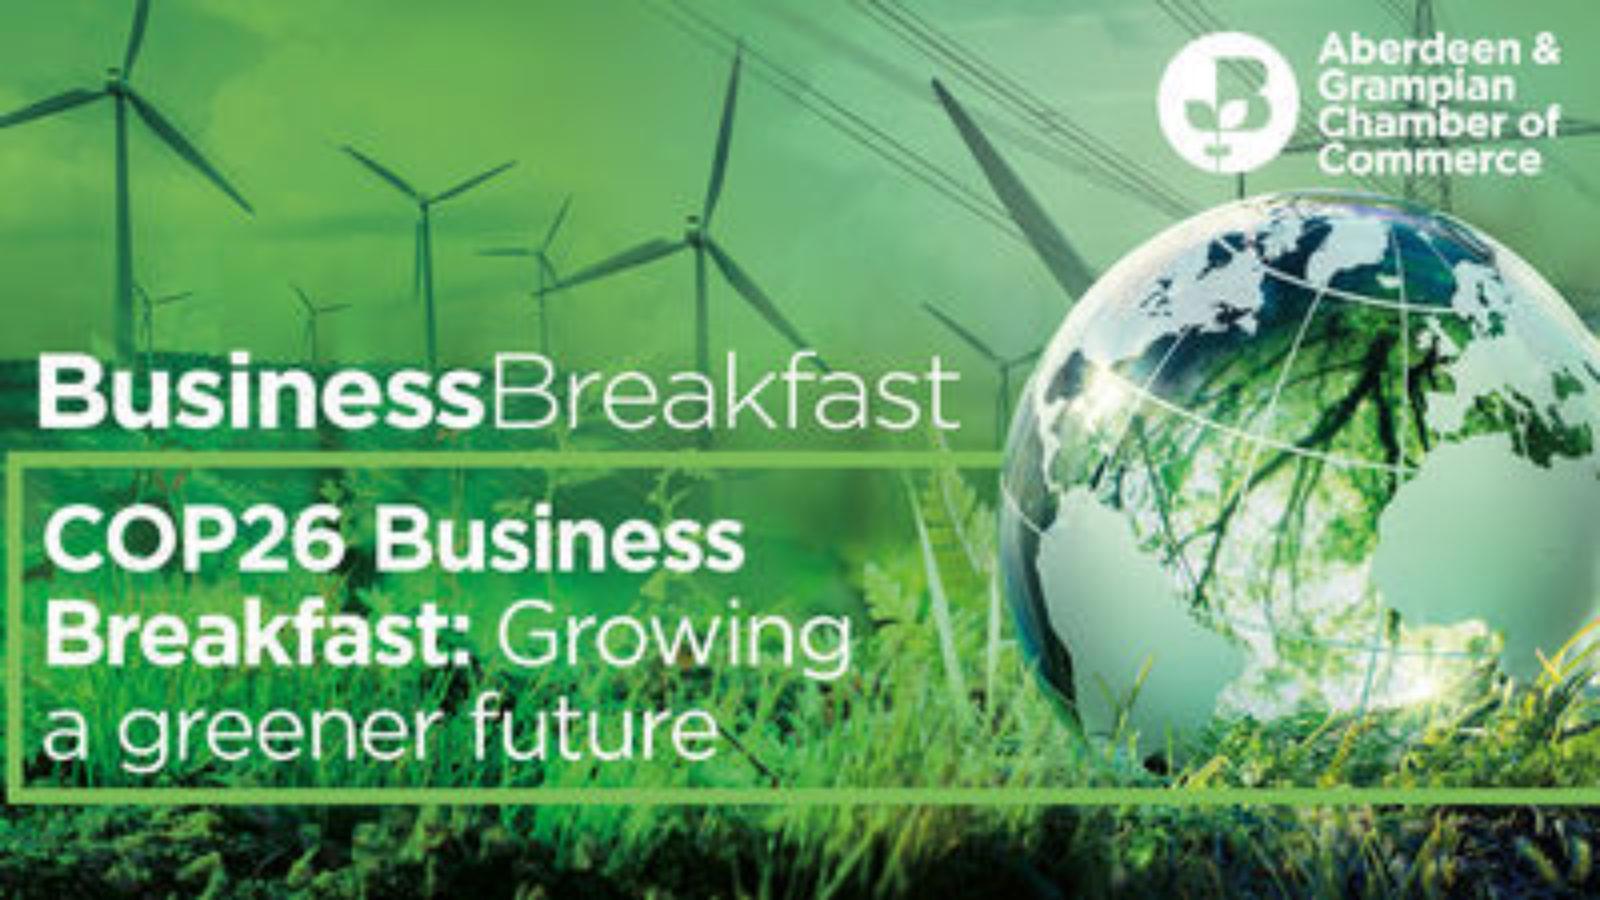 COP26 Business Breakfast: Growing a greener future